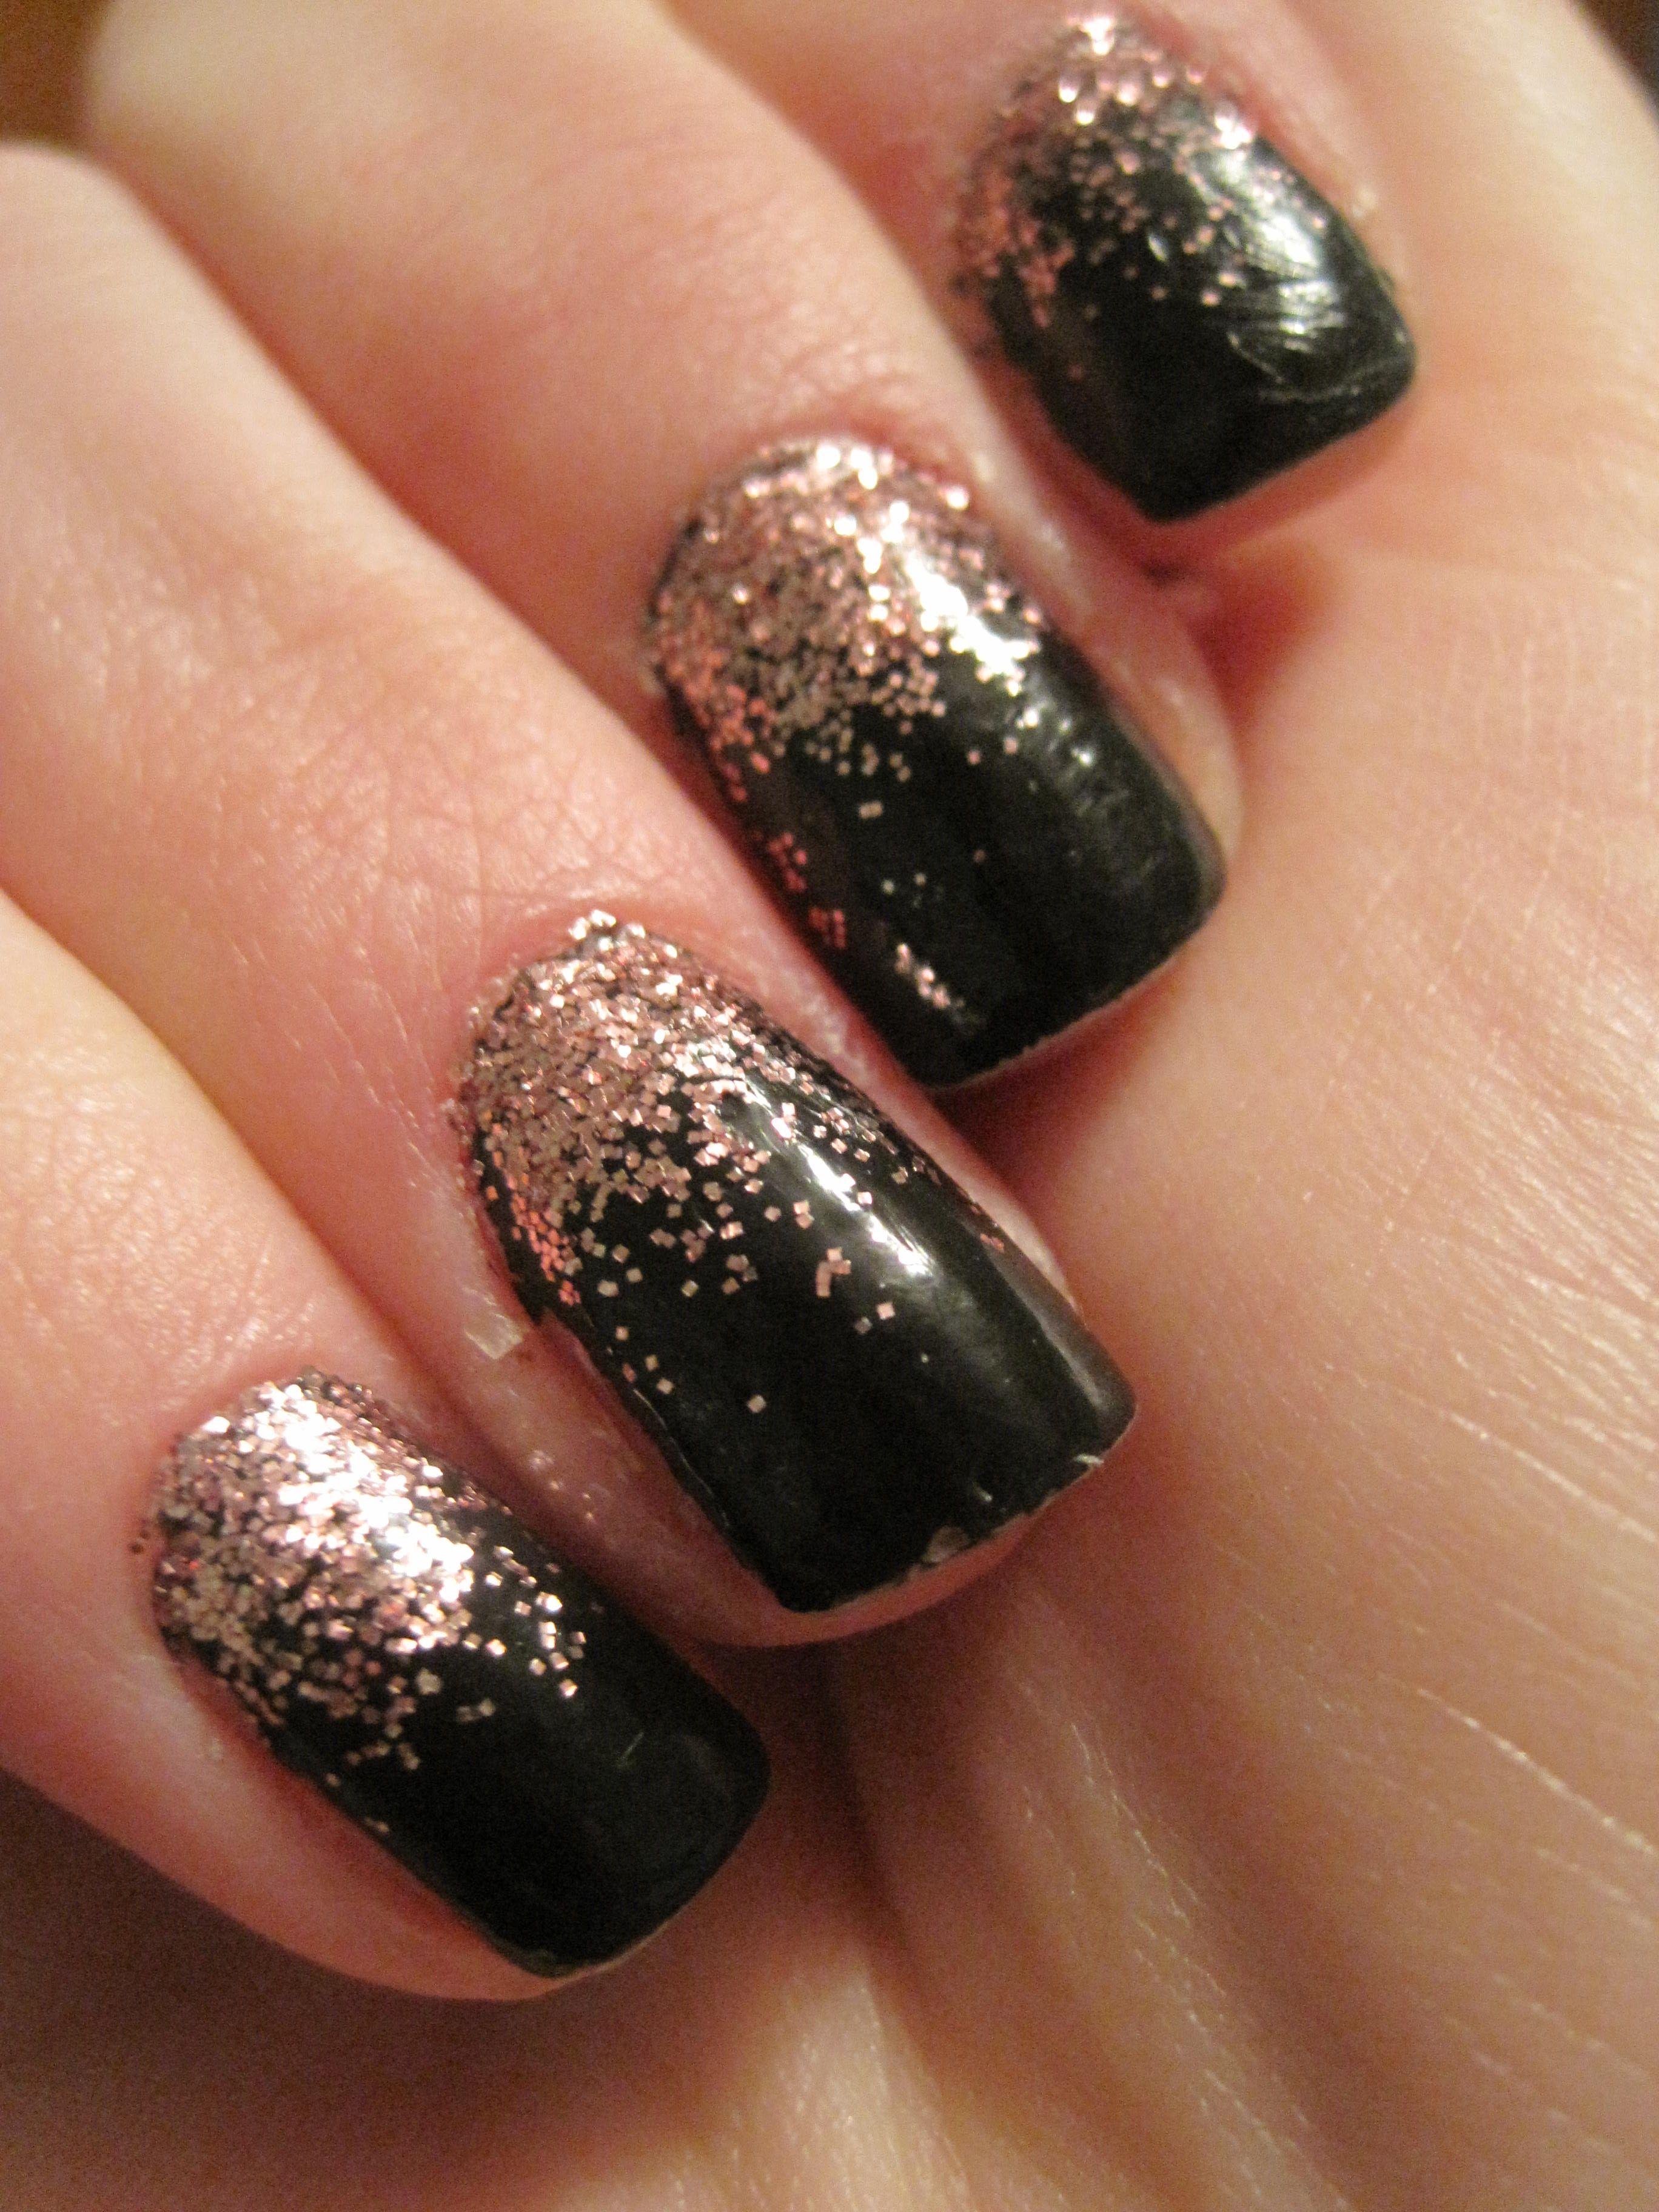 my spring break 2012 nails!!